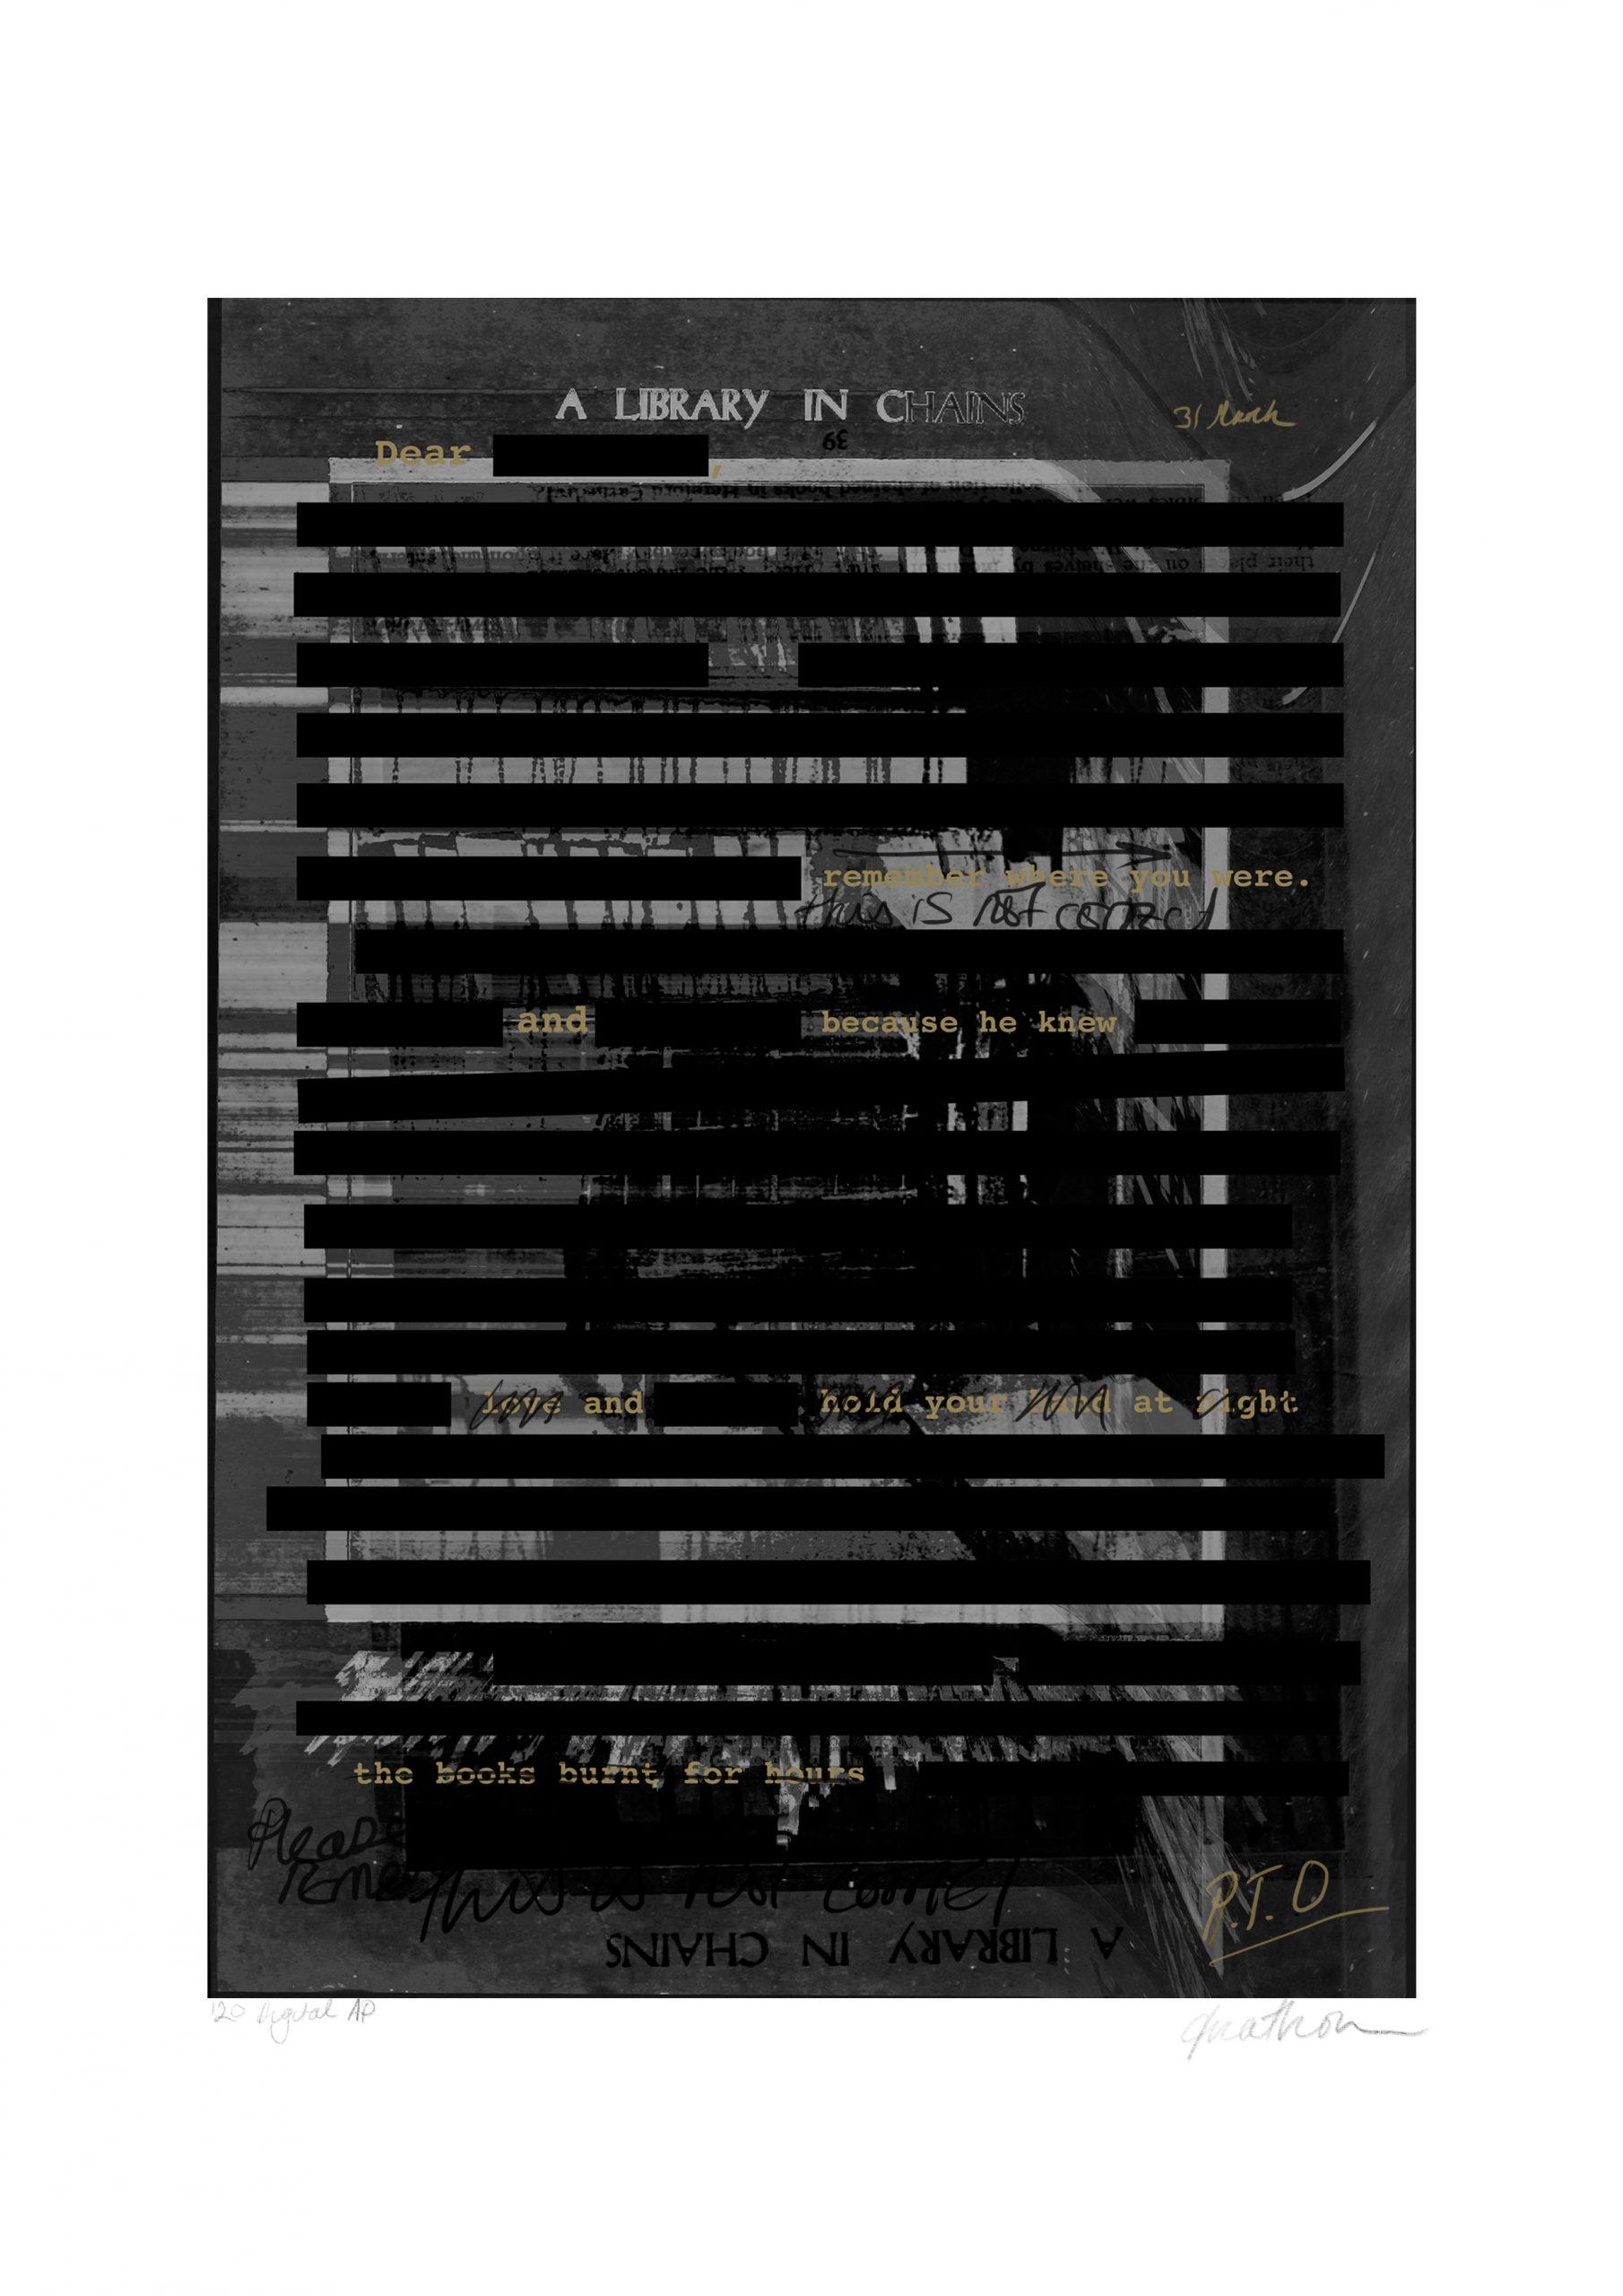 (18) Jonathon Harris - The flames danced for hours (redacted) Image